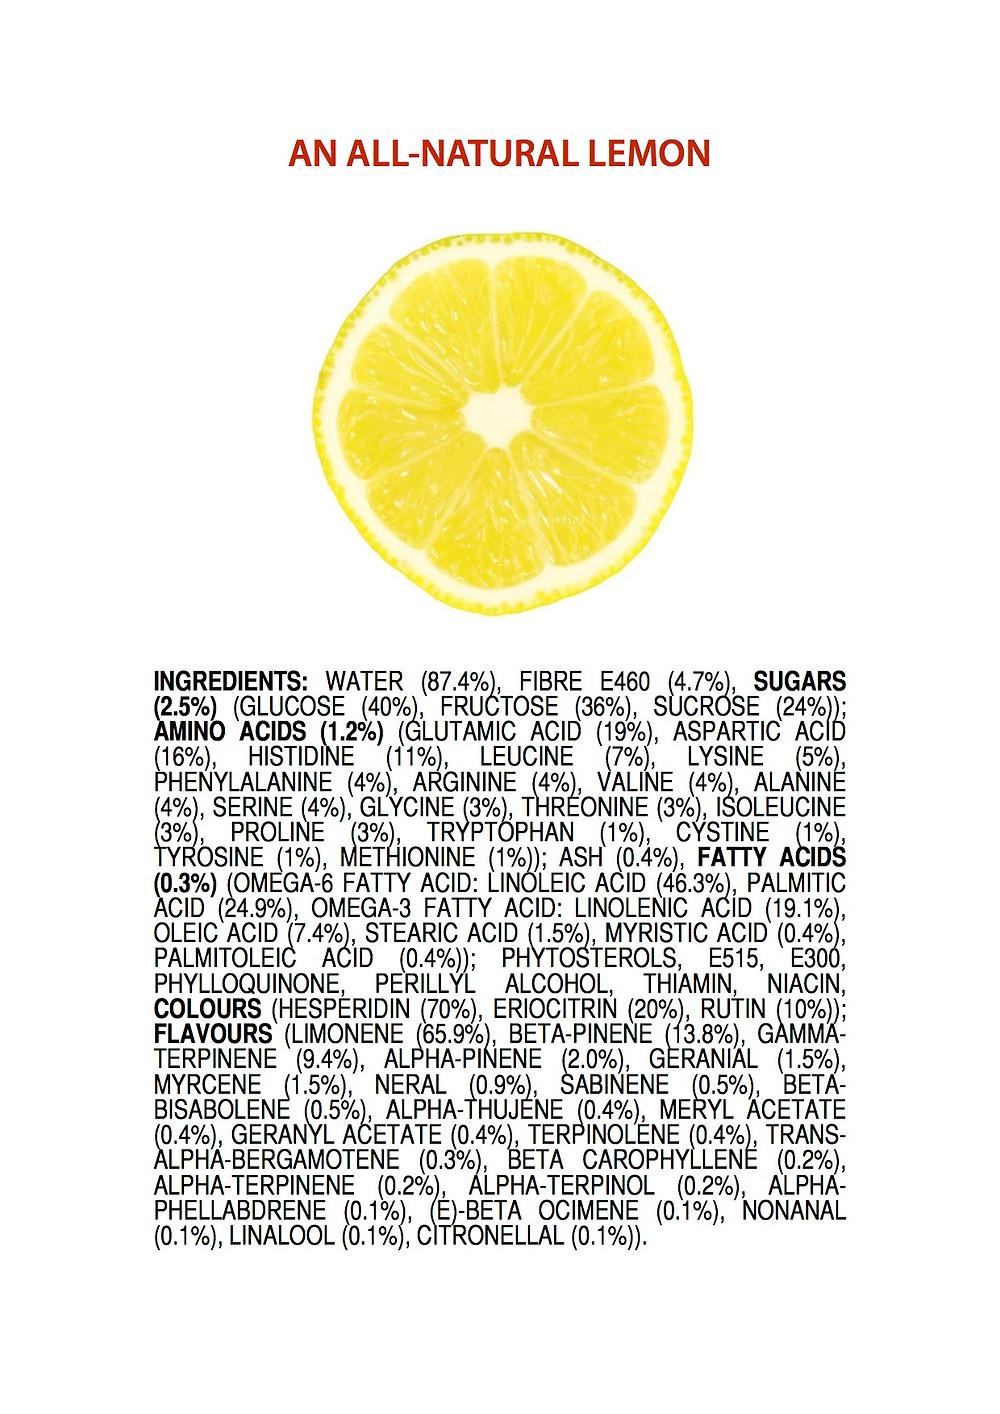 Städa med citron bild ingredients-of-a-lemon-english.jpg